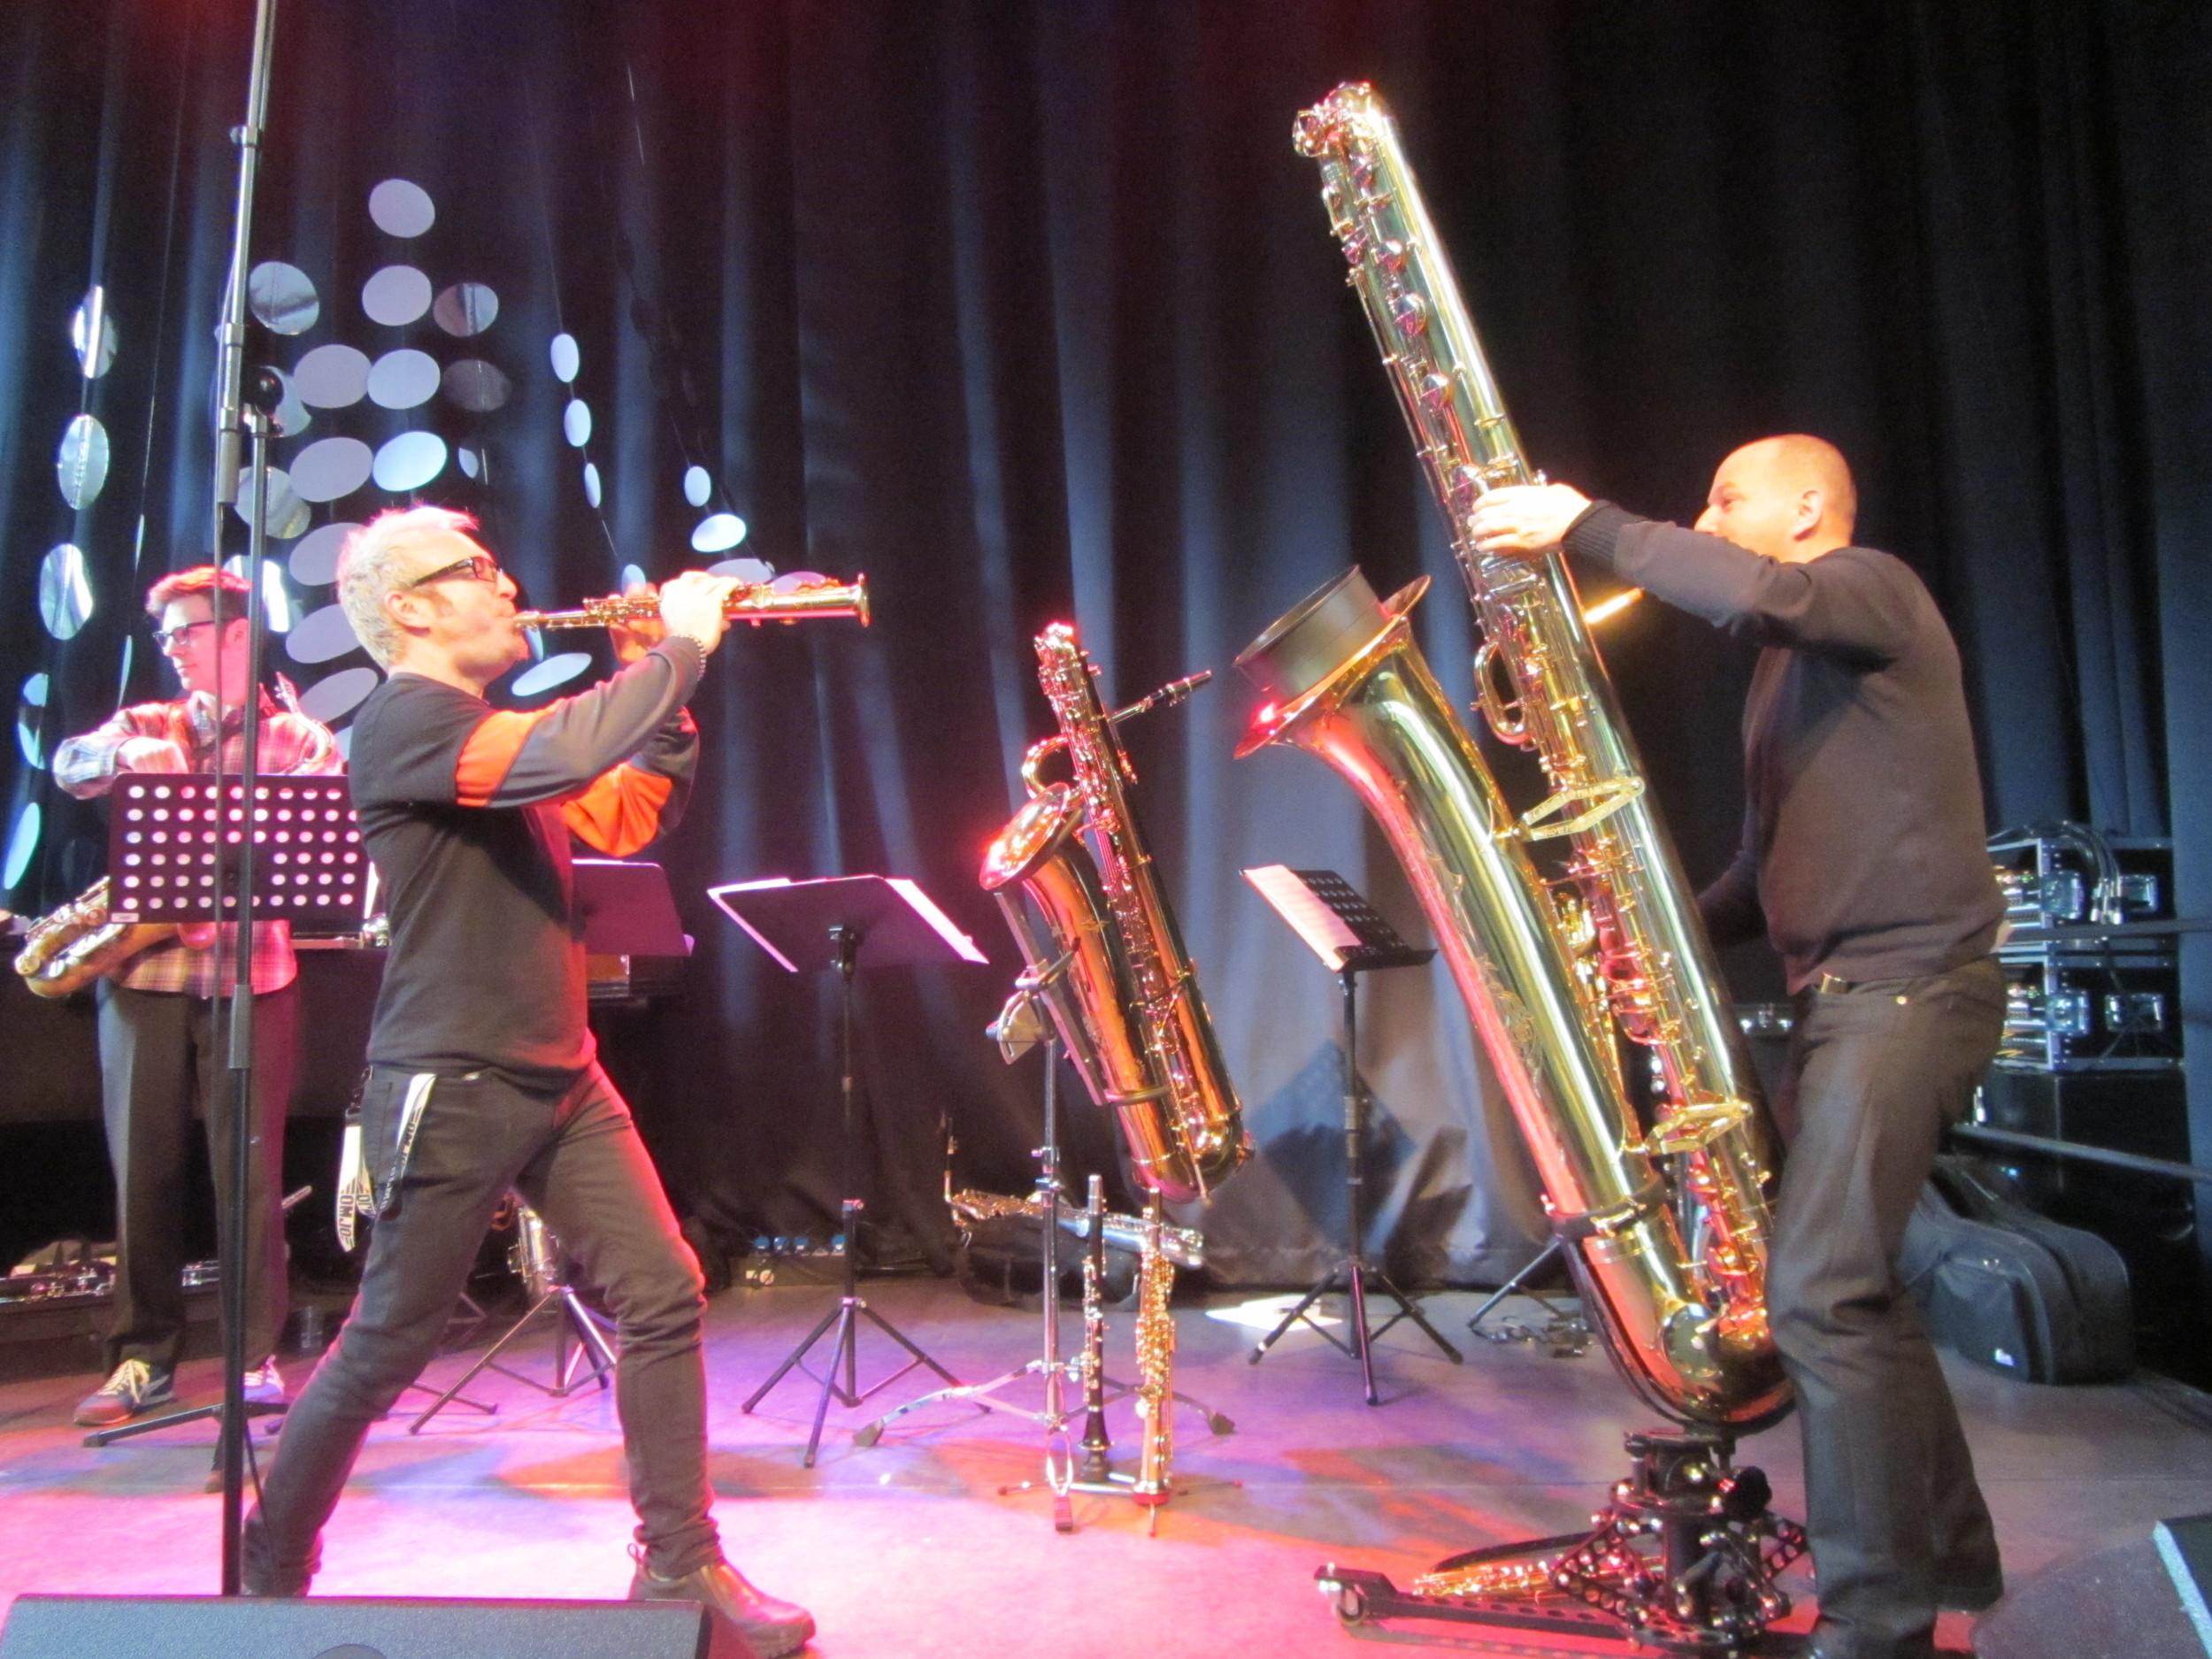 Dynamic Duo - Mars Williams & Thomas Meyer